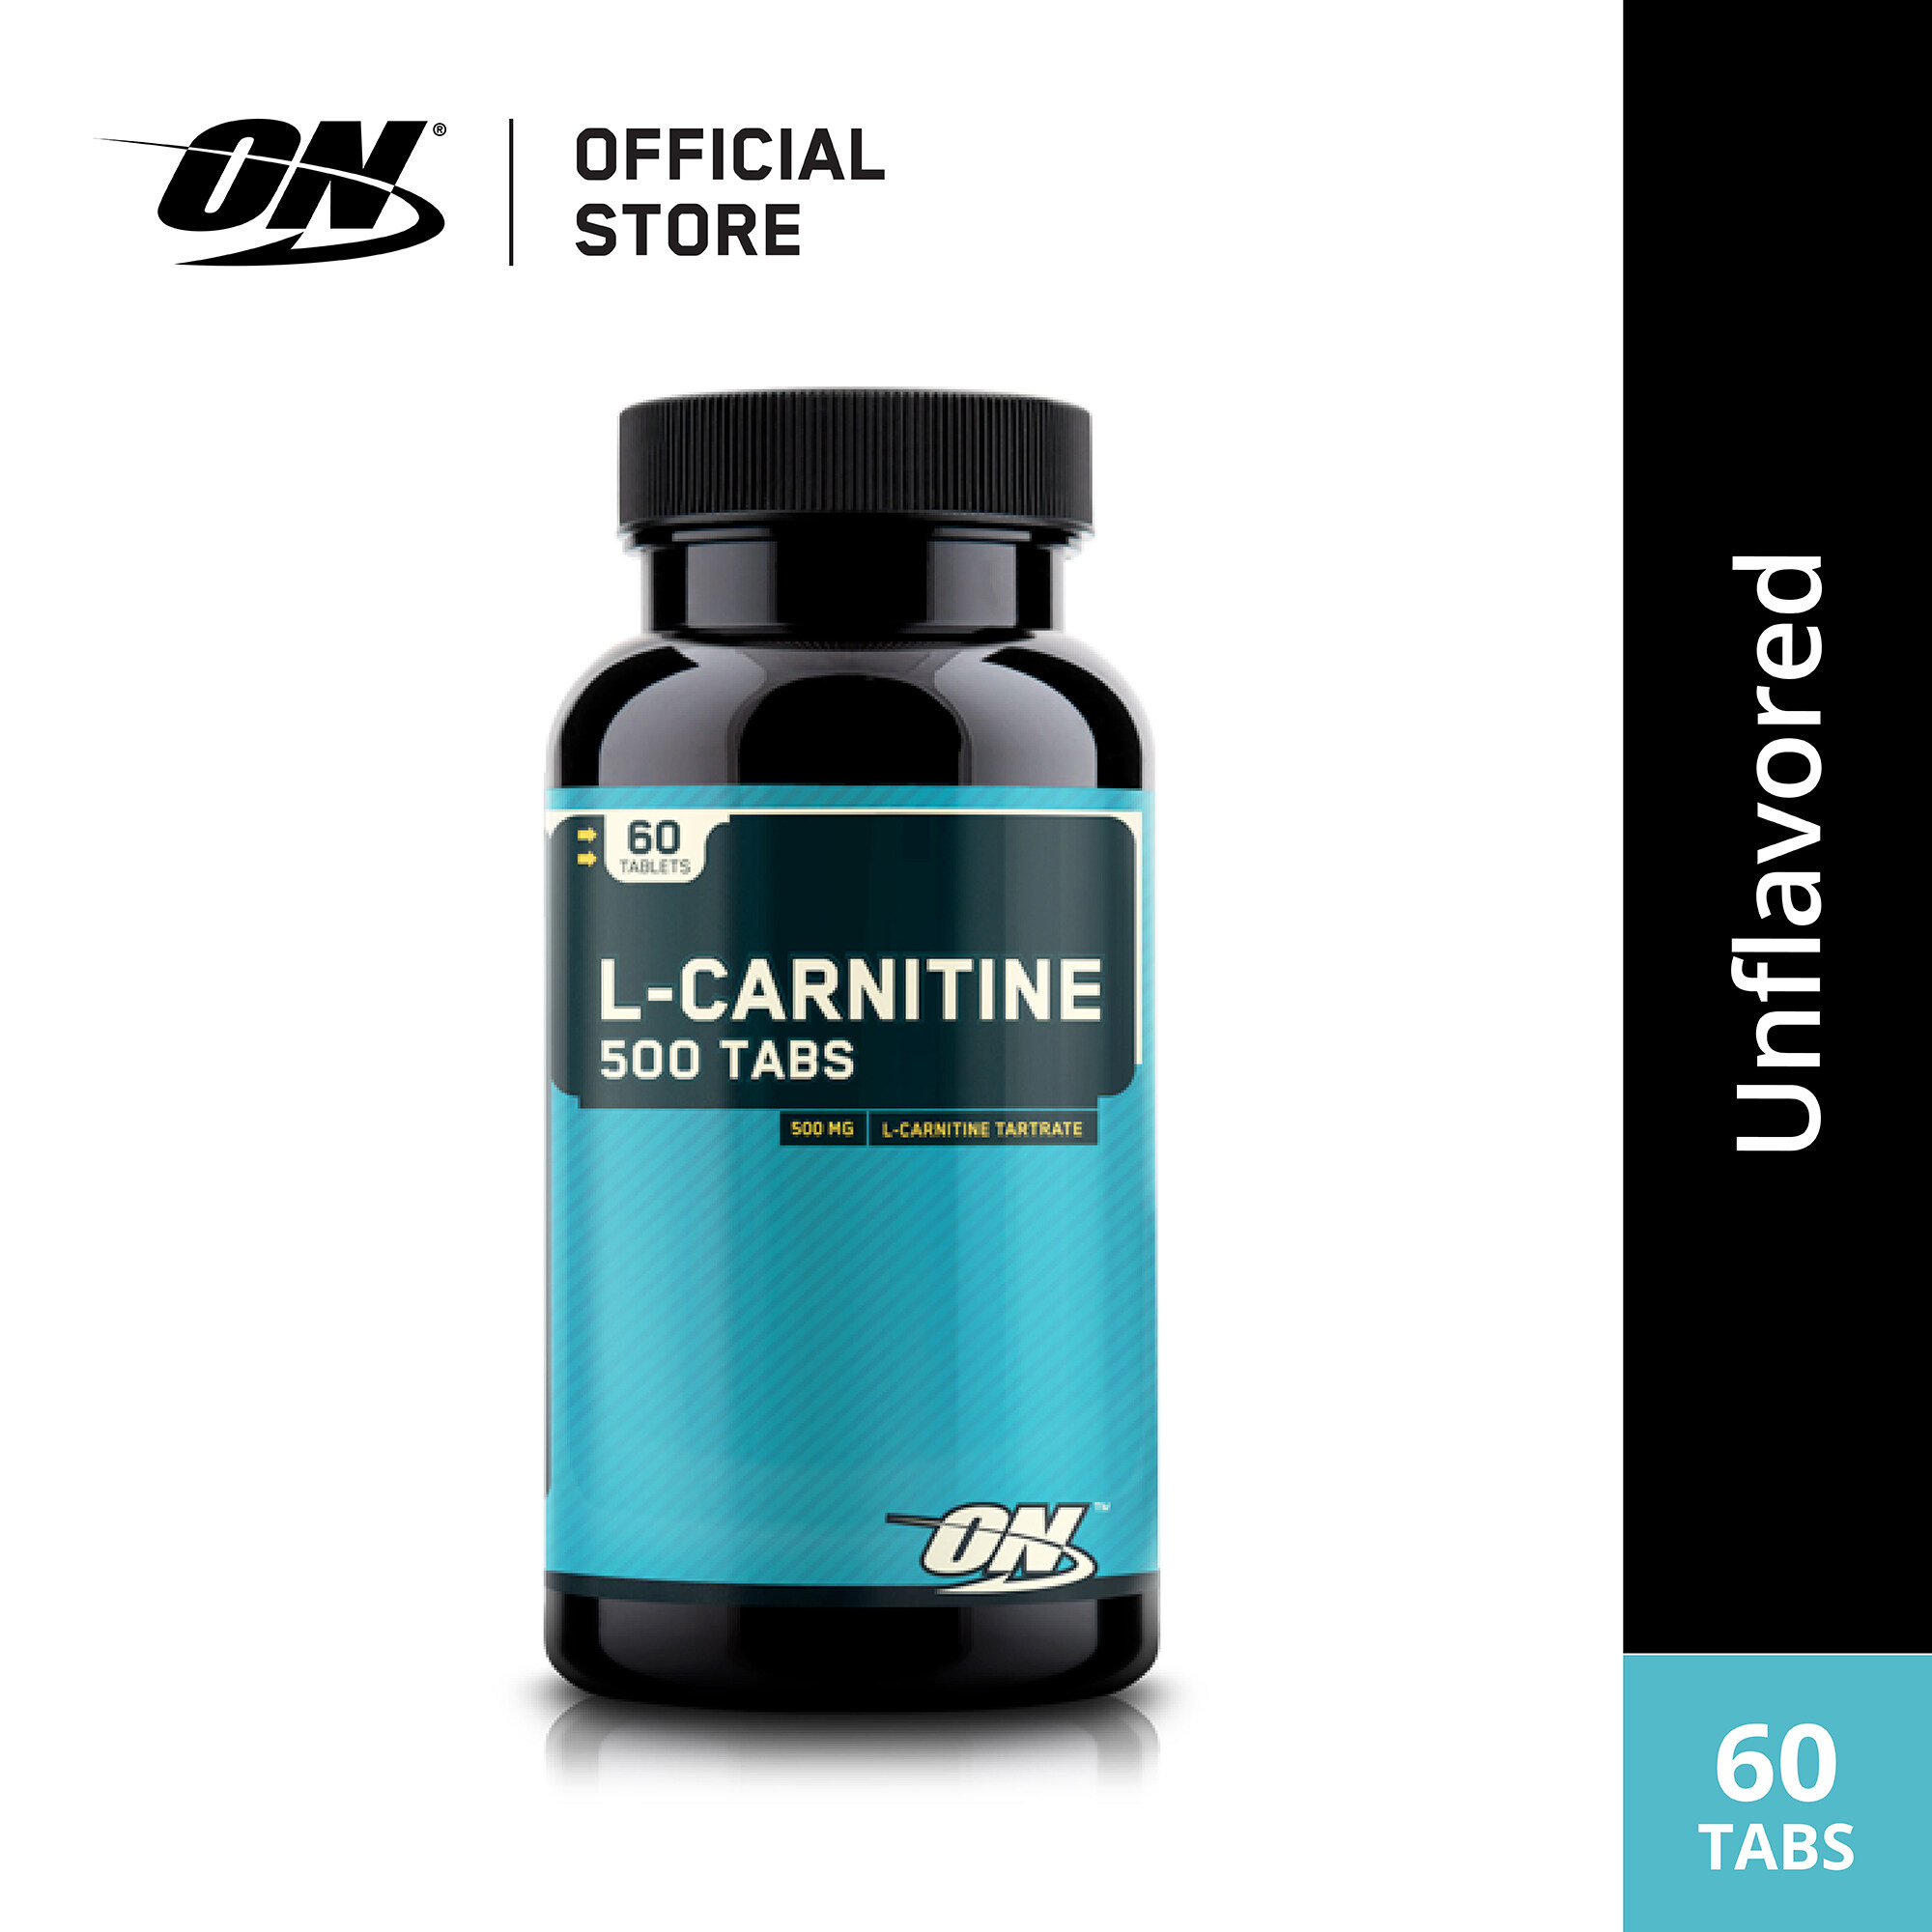 Optimum Nutrition L-Carnitine 500mg 60 Tab เผาผลาญไขมัน